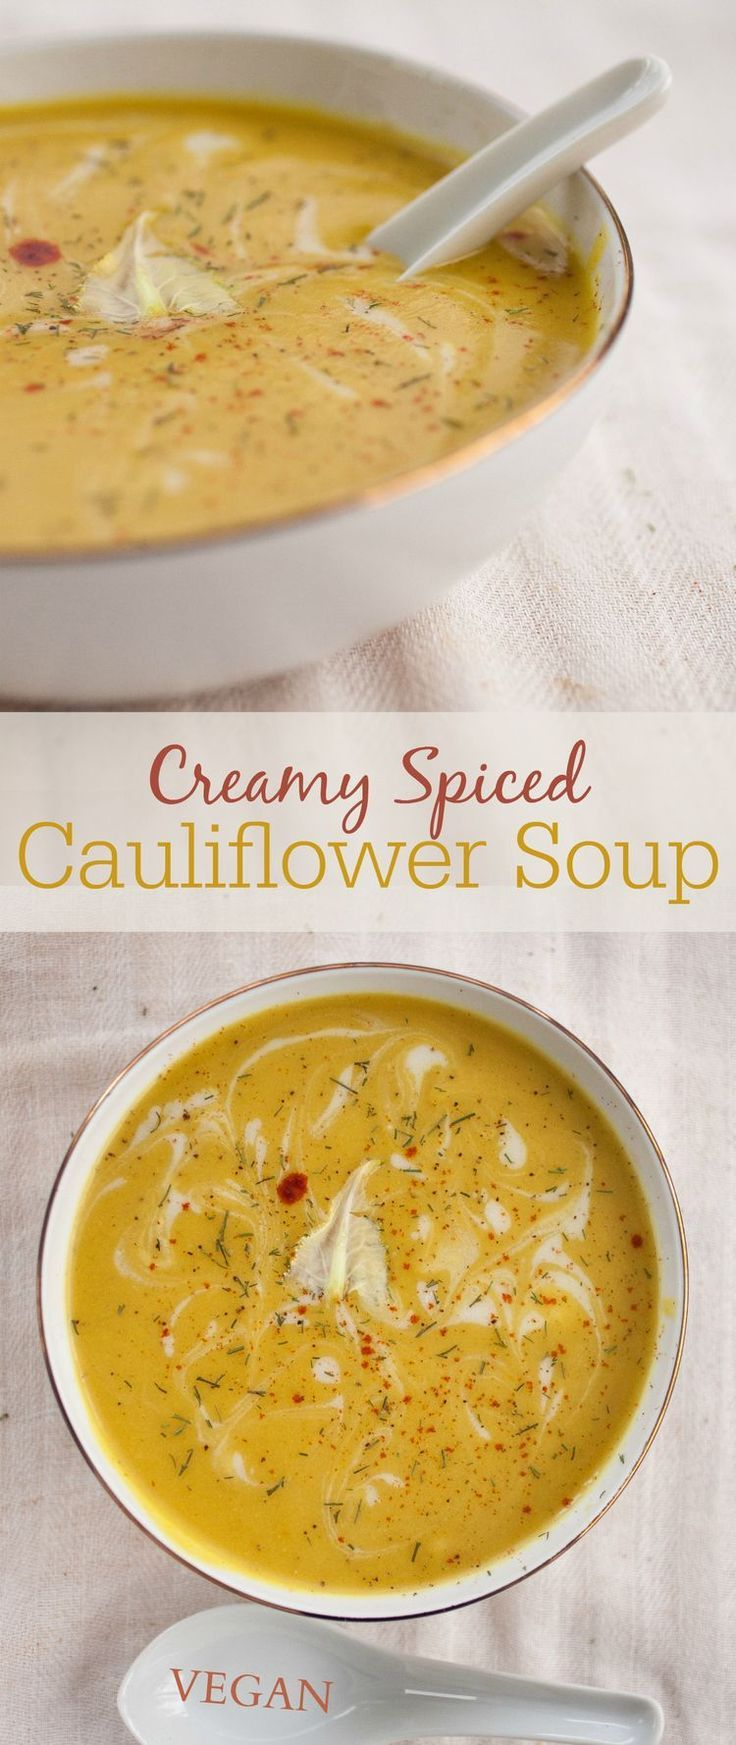 Photo of Creamy Spiced Cauliflower Soup